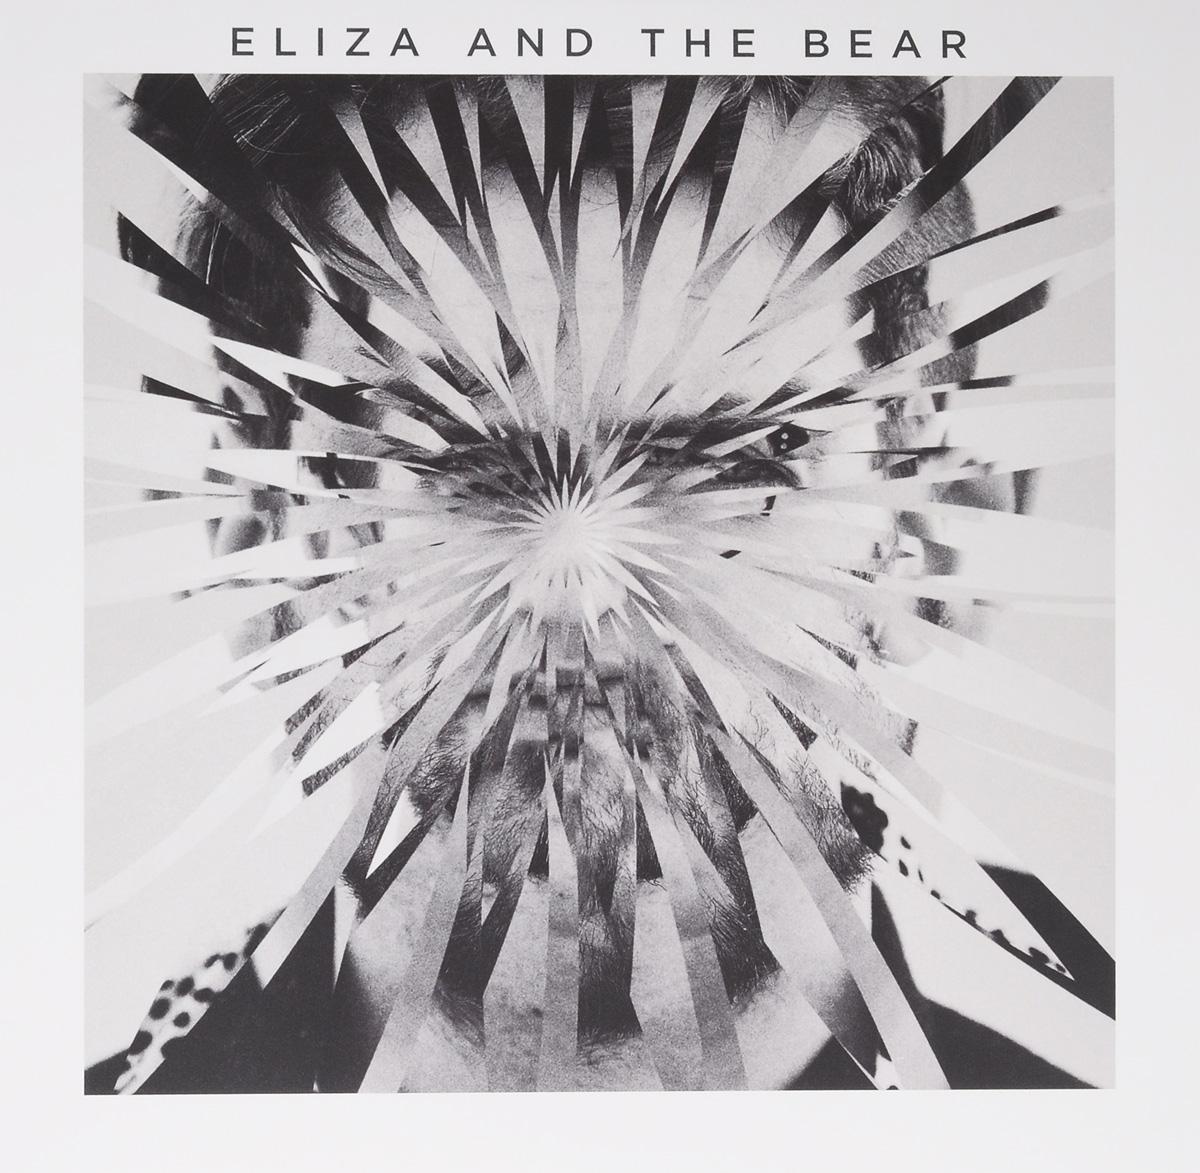 Eliza And The Bear Eliza And The Bear. Eliza And The Bear (LP) sara eliza wiltse myths and motherplays